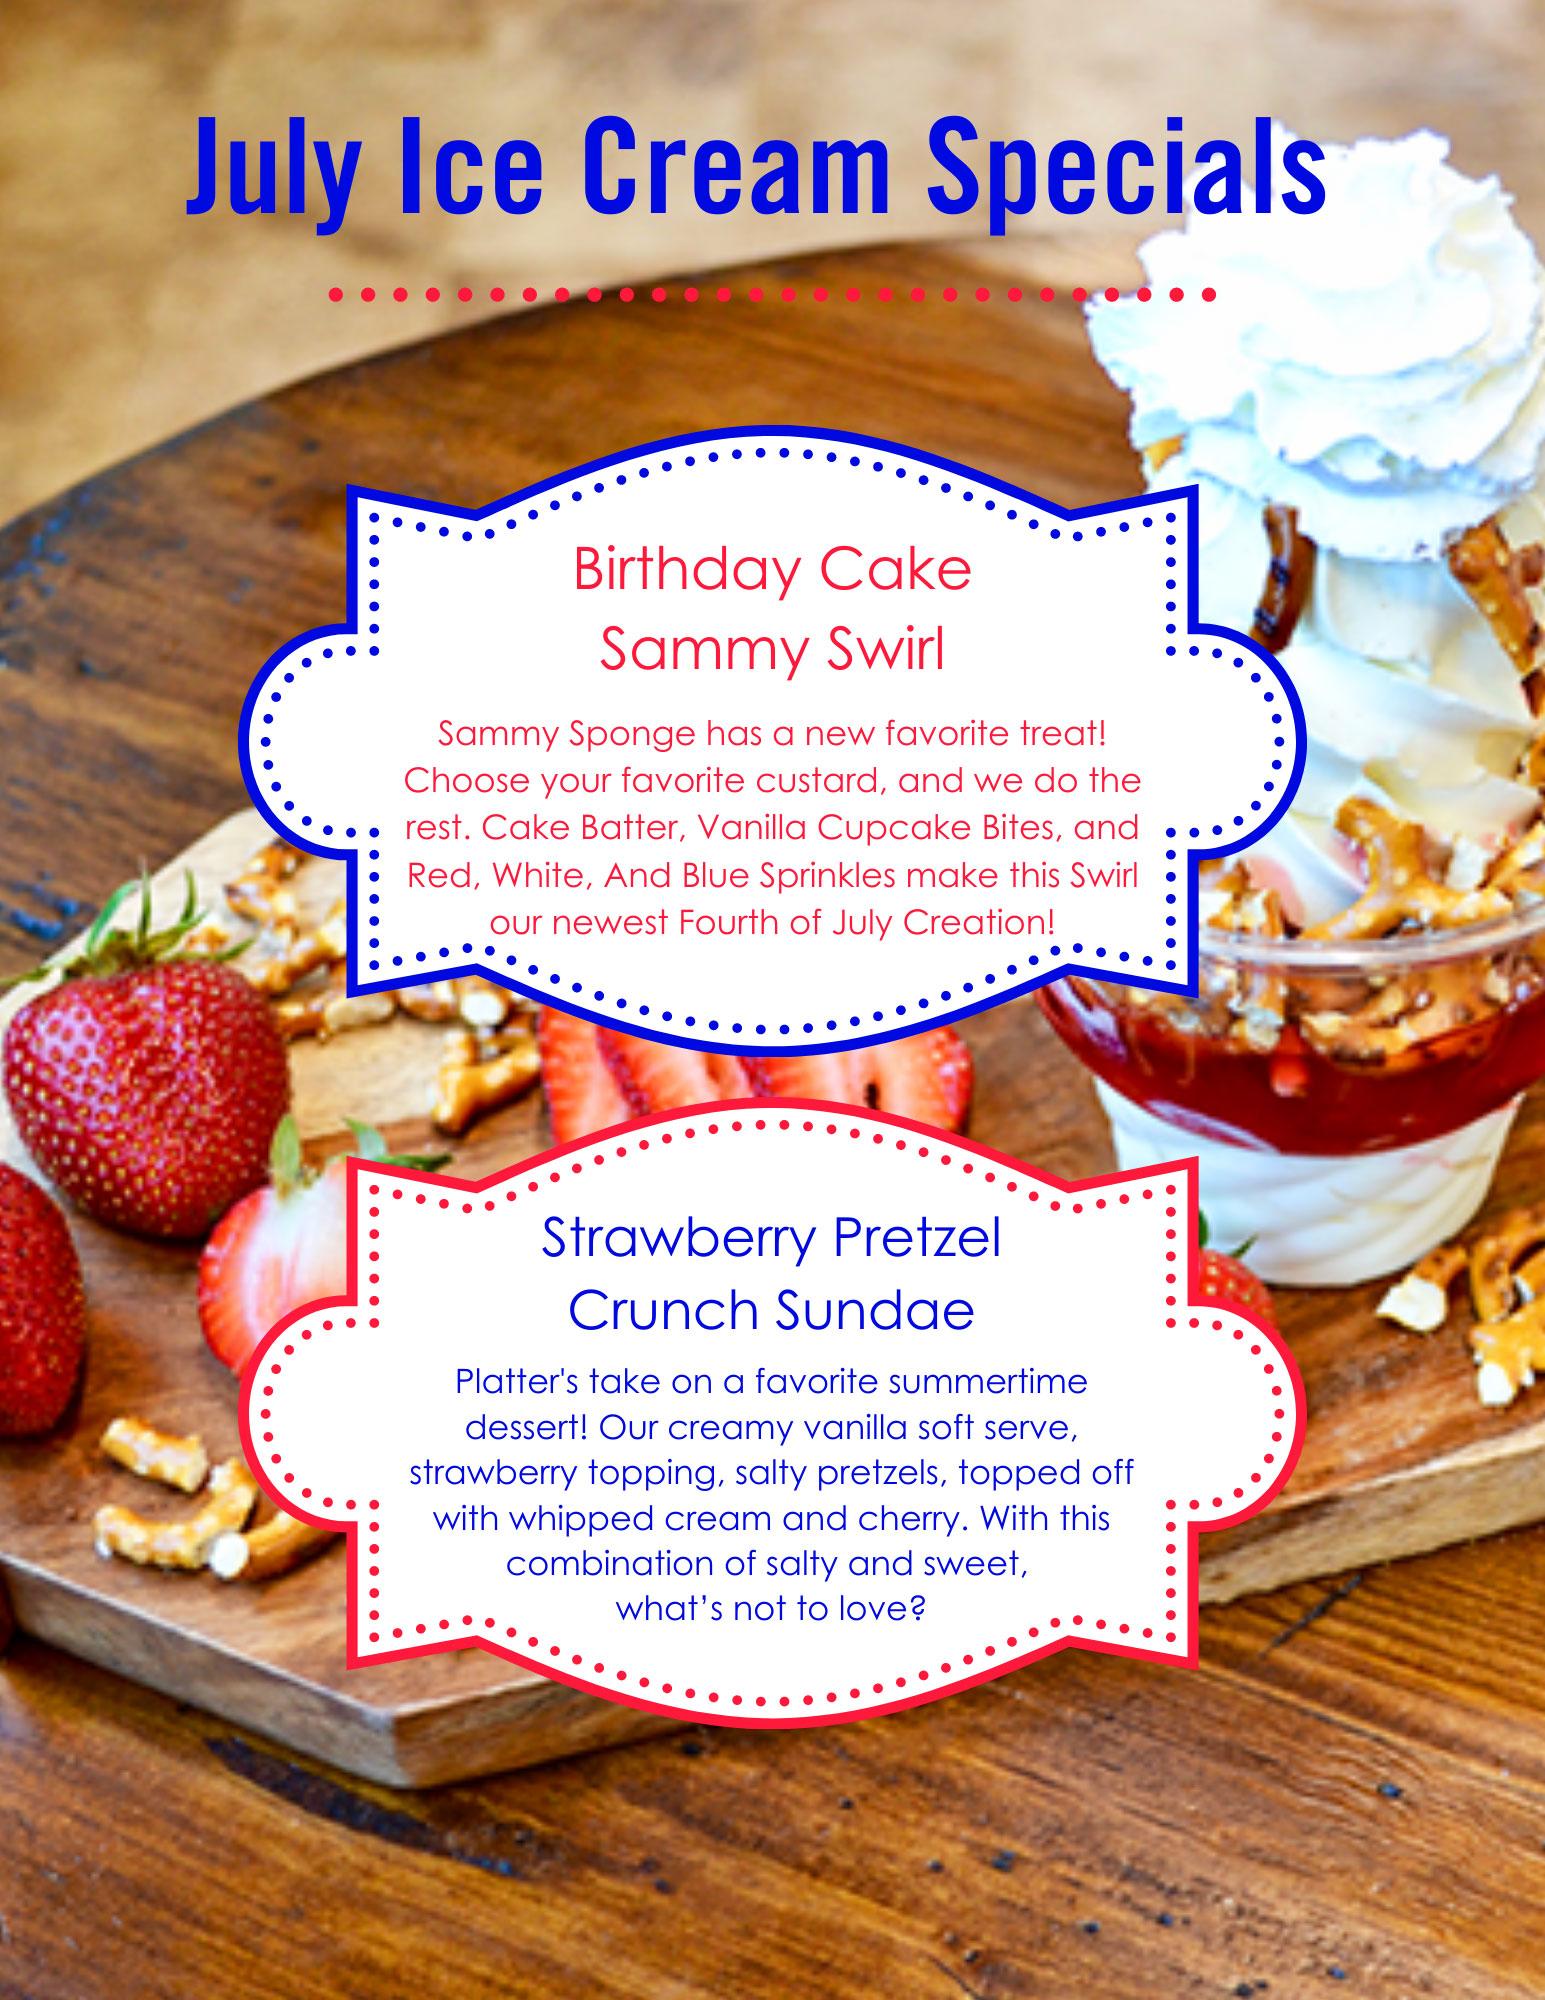 platters-ice-cream-shoppe-july-specials.jpg